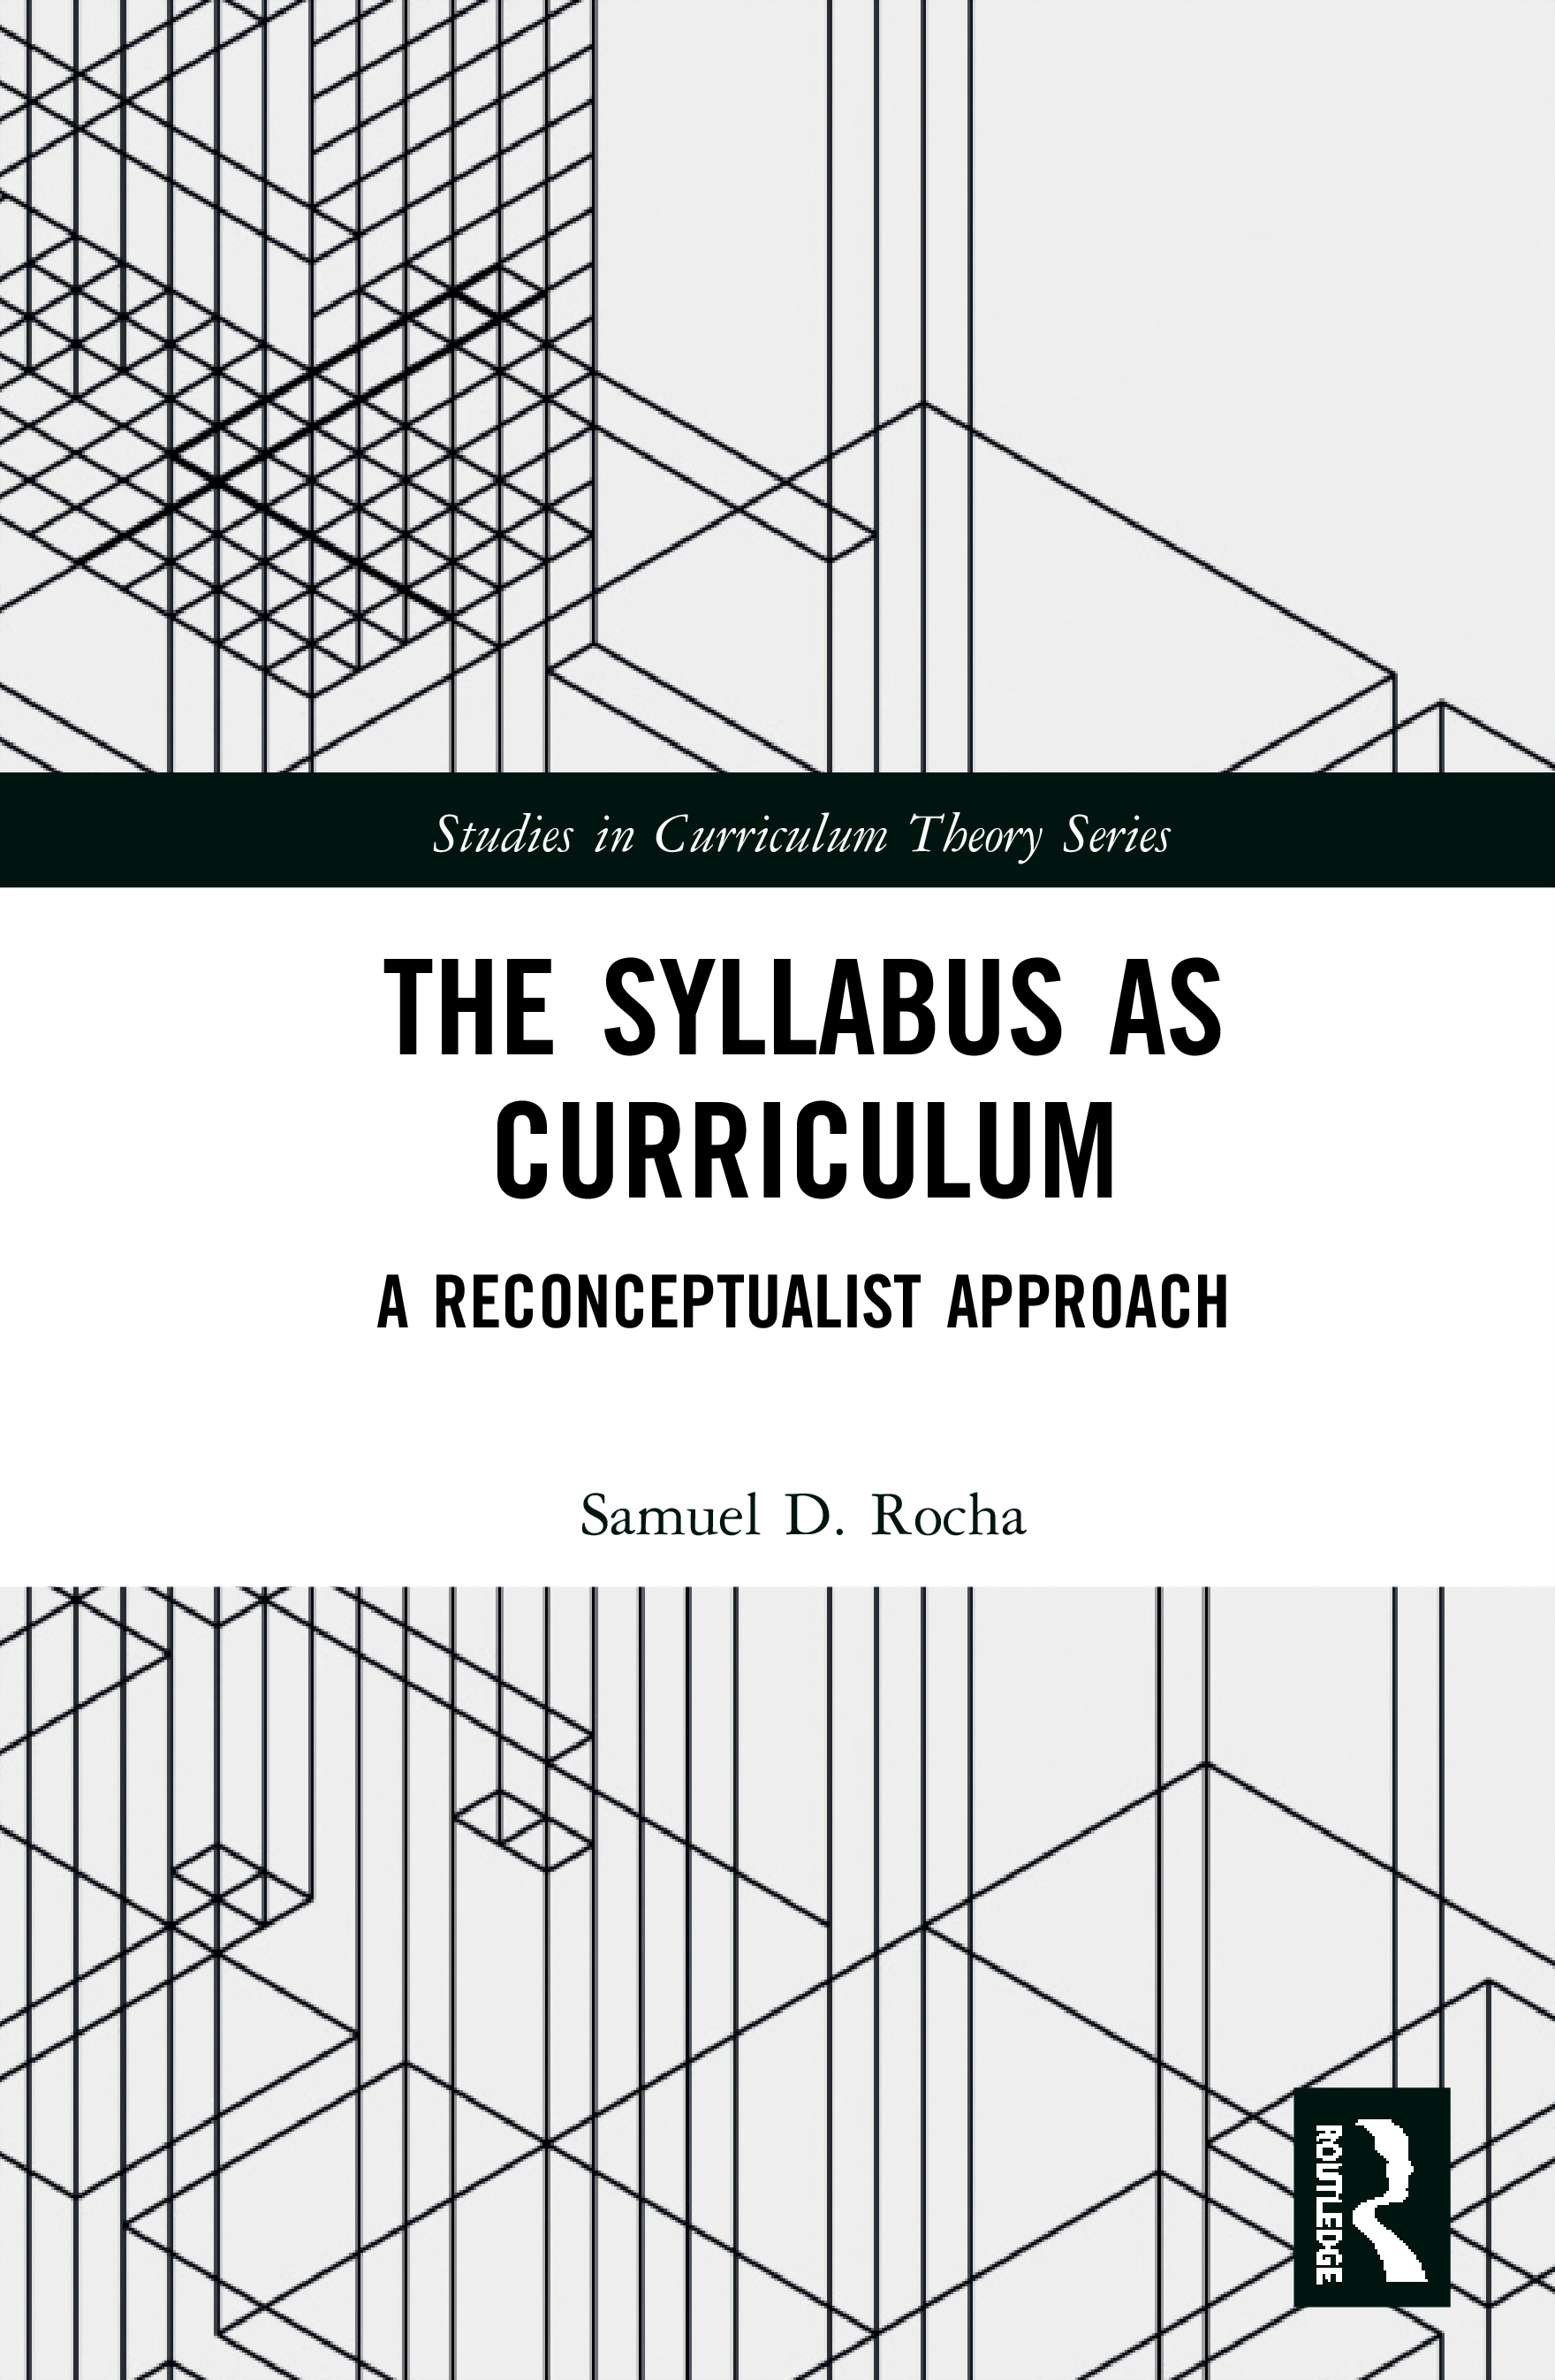 The Syllabus as Curriculum: The Syllabus as Curriculum book cover